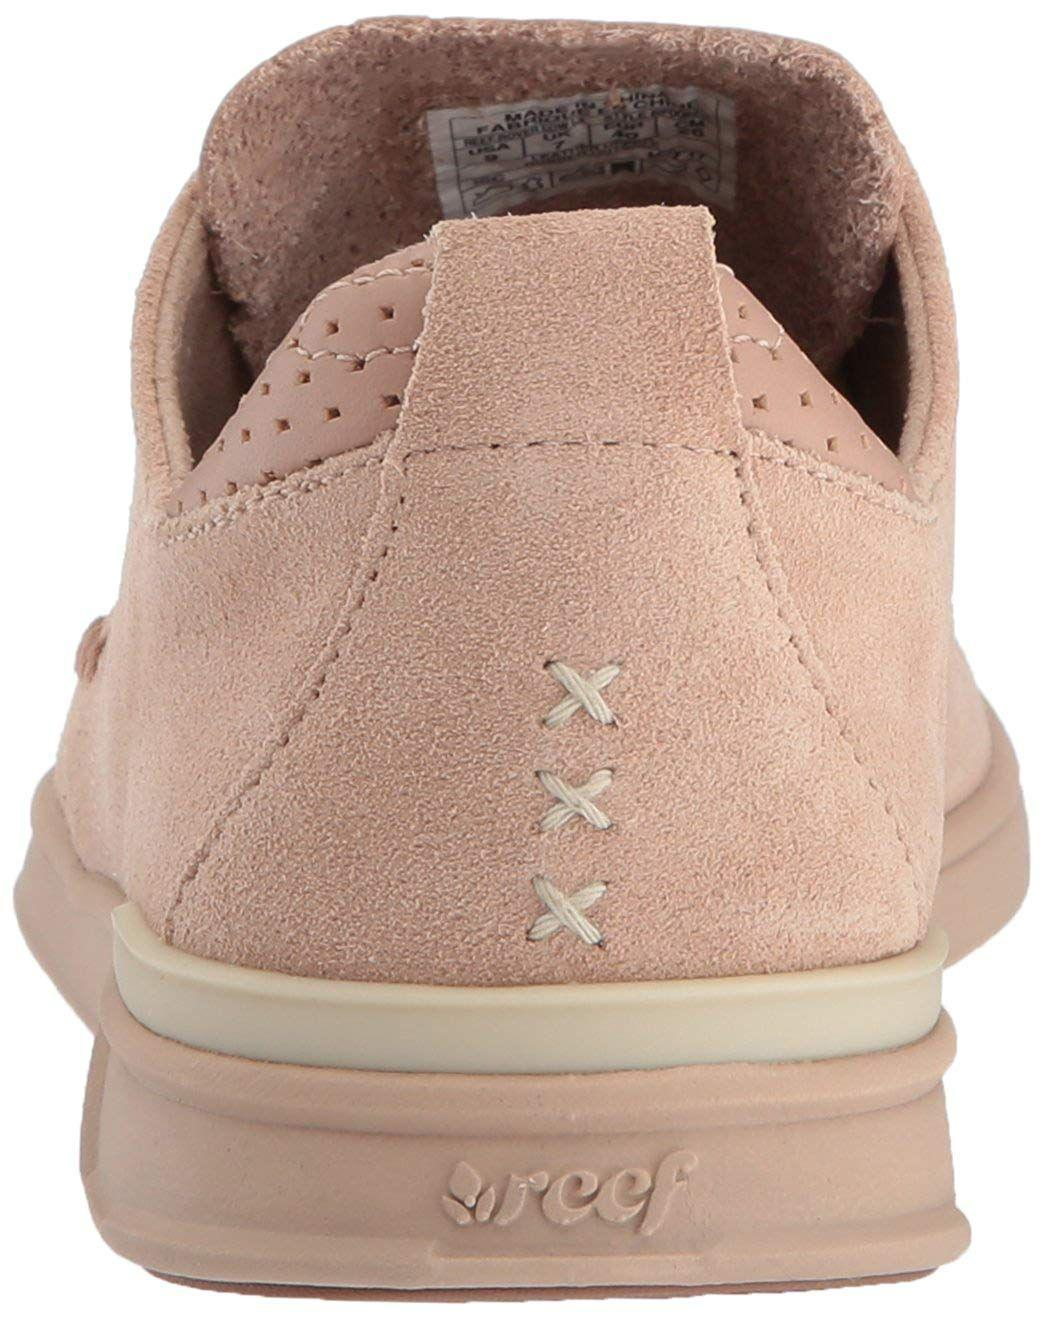 853c42a15724 Reef - Multicolor Women s Rover Low Lx Fashion Sneaker - Lyst. View  fullscreen